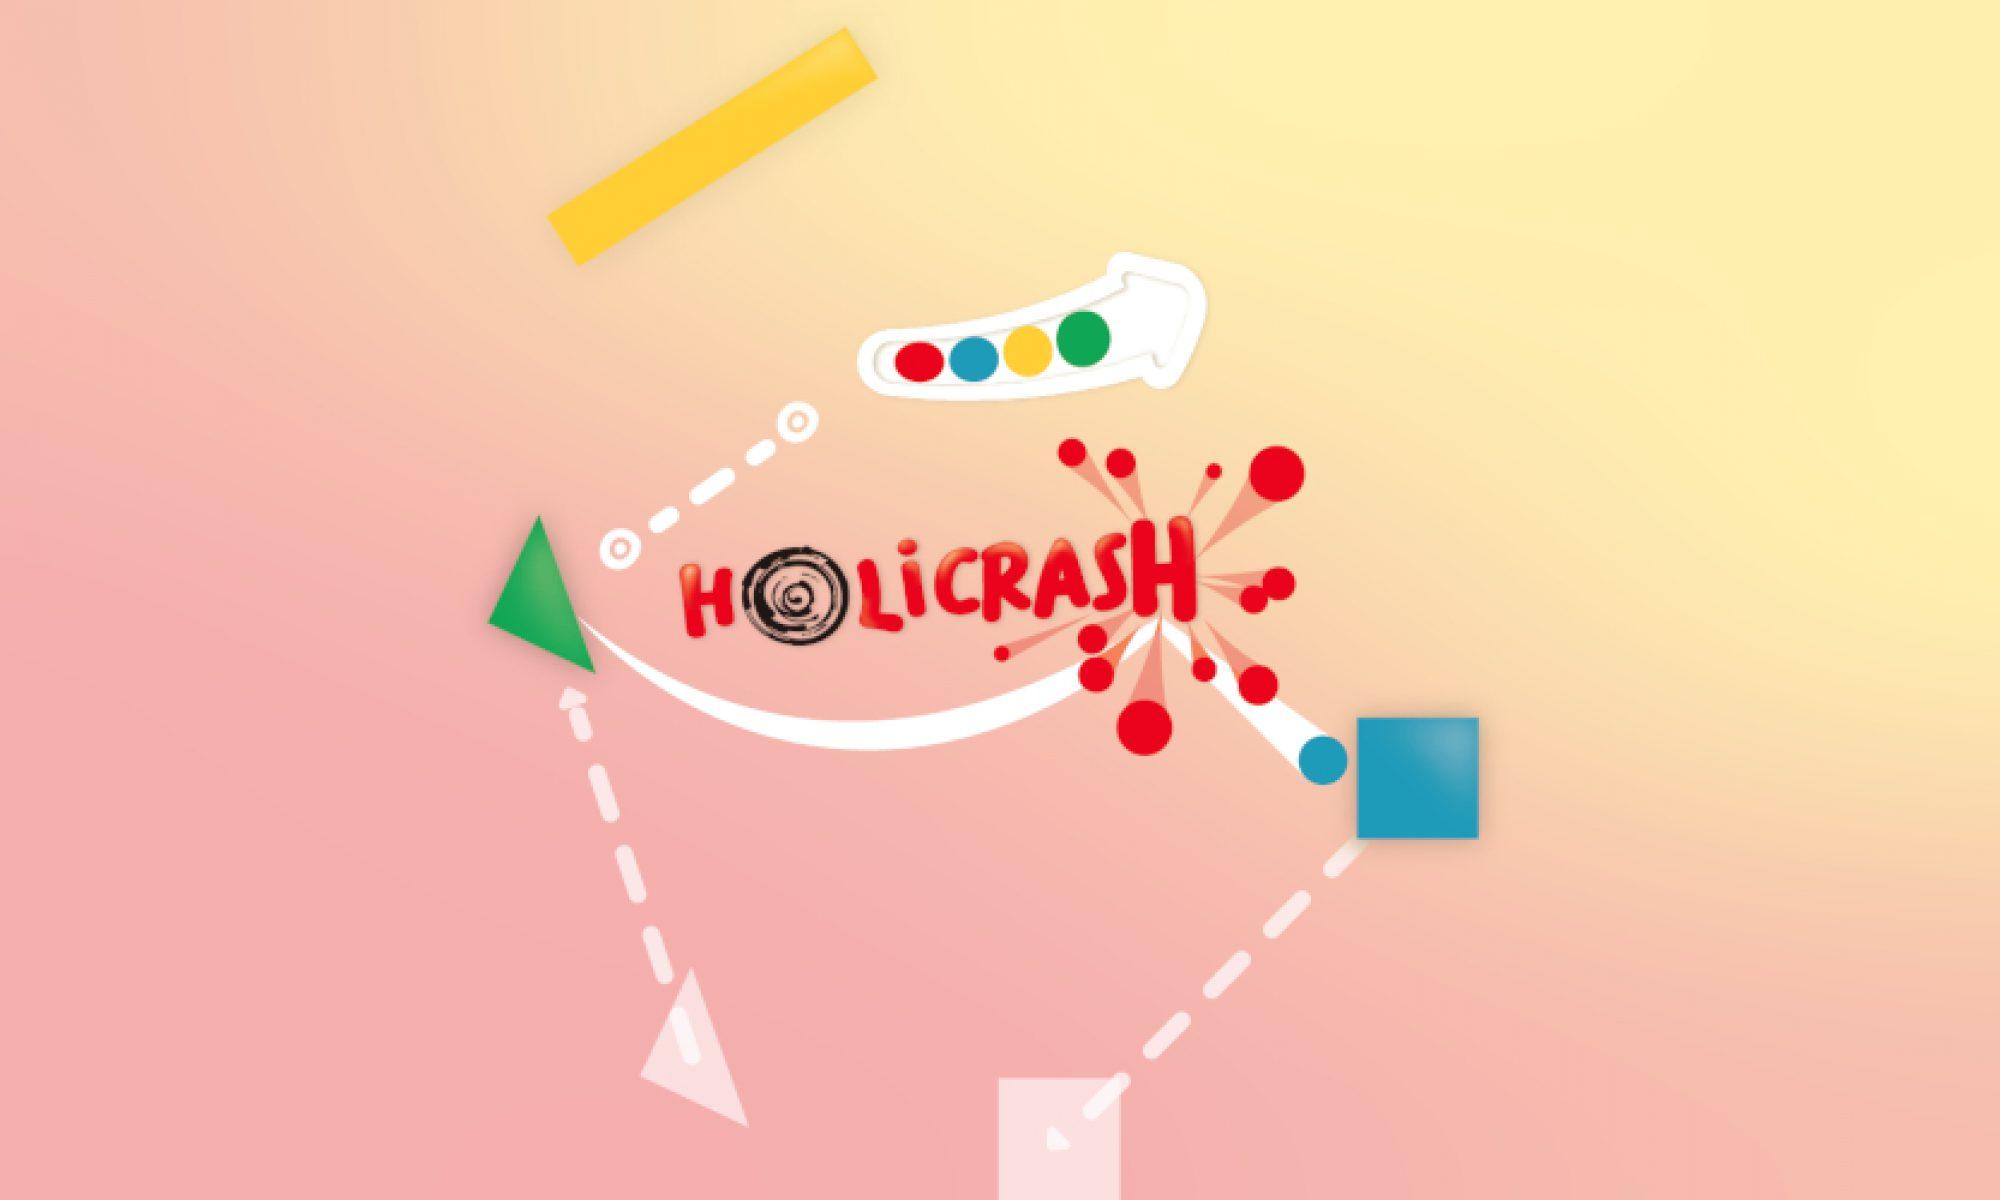 HoliCrash